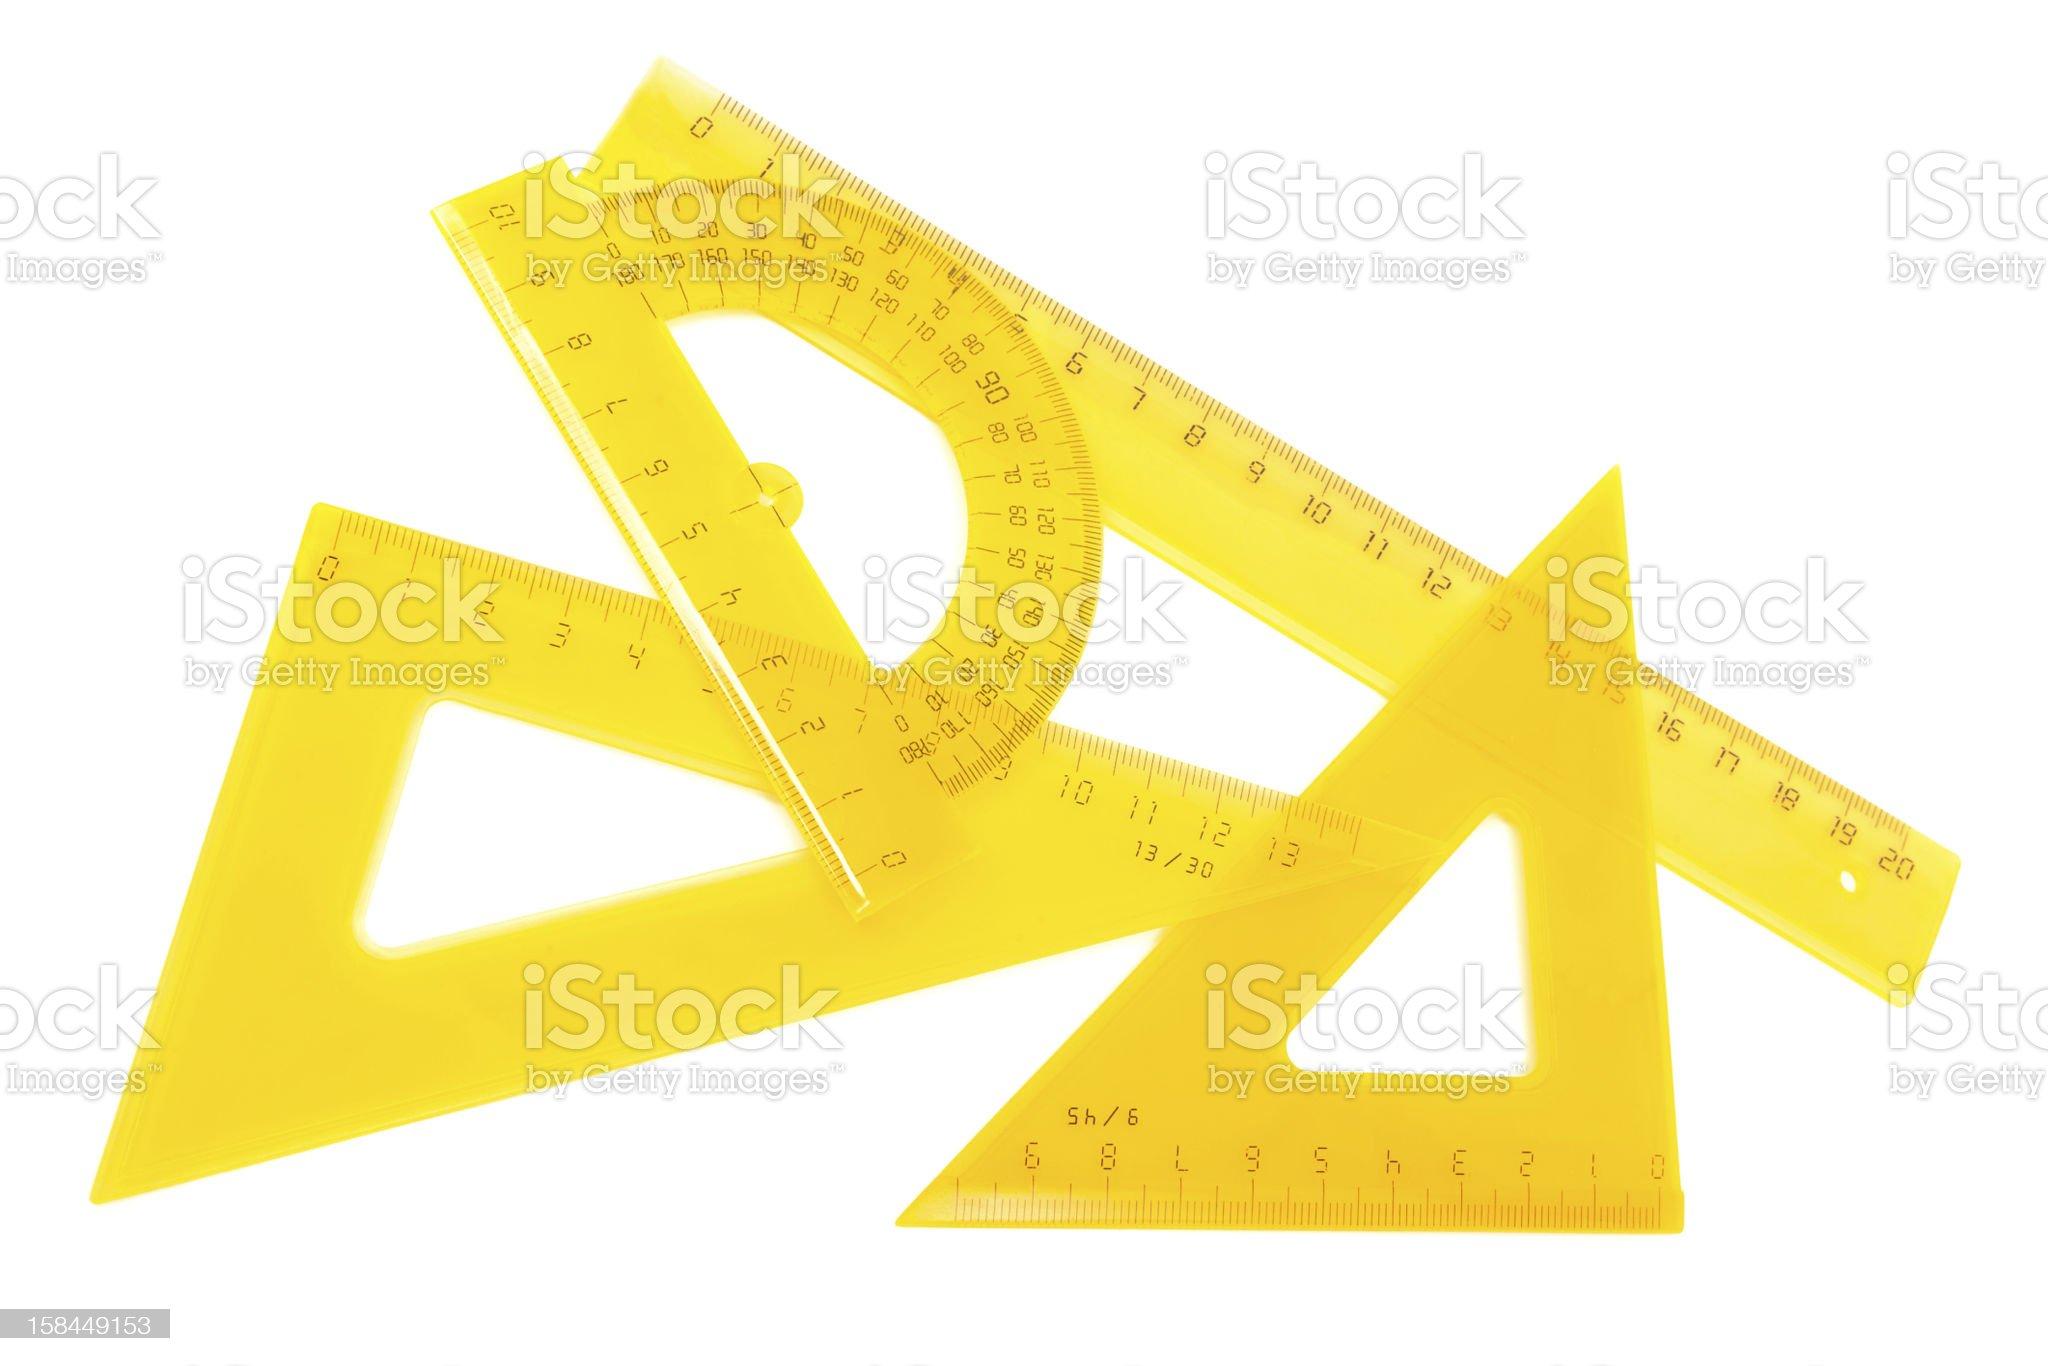 set of measuring tools royalty-free stock photo